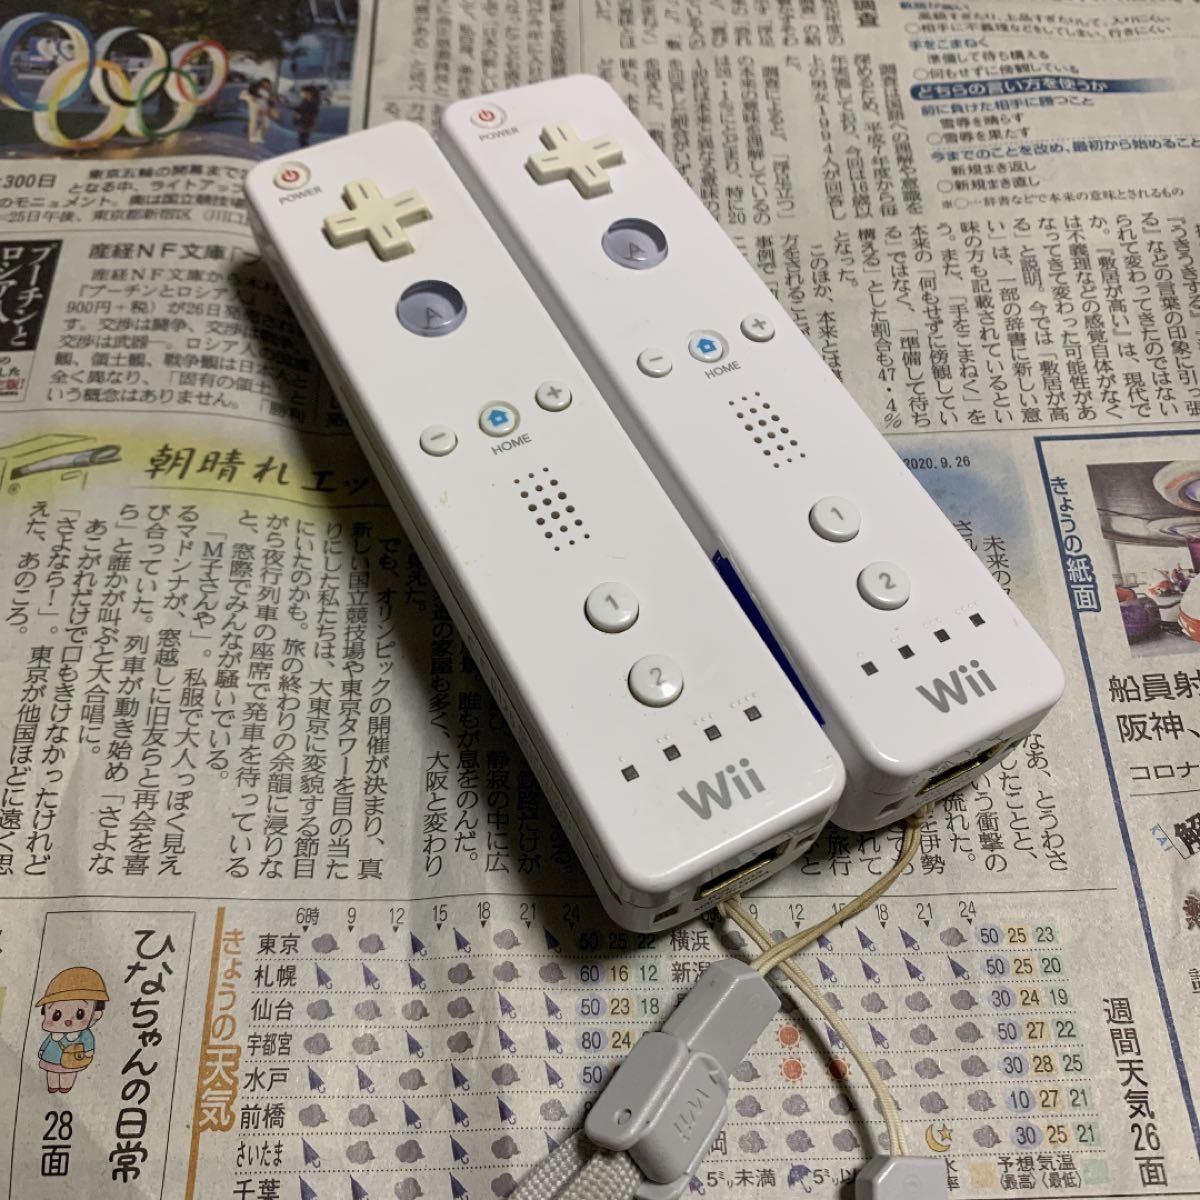 Wiiリモコン 任天堂 ホワイト